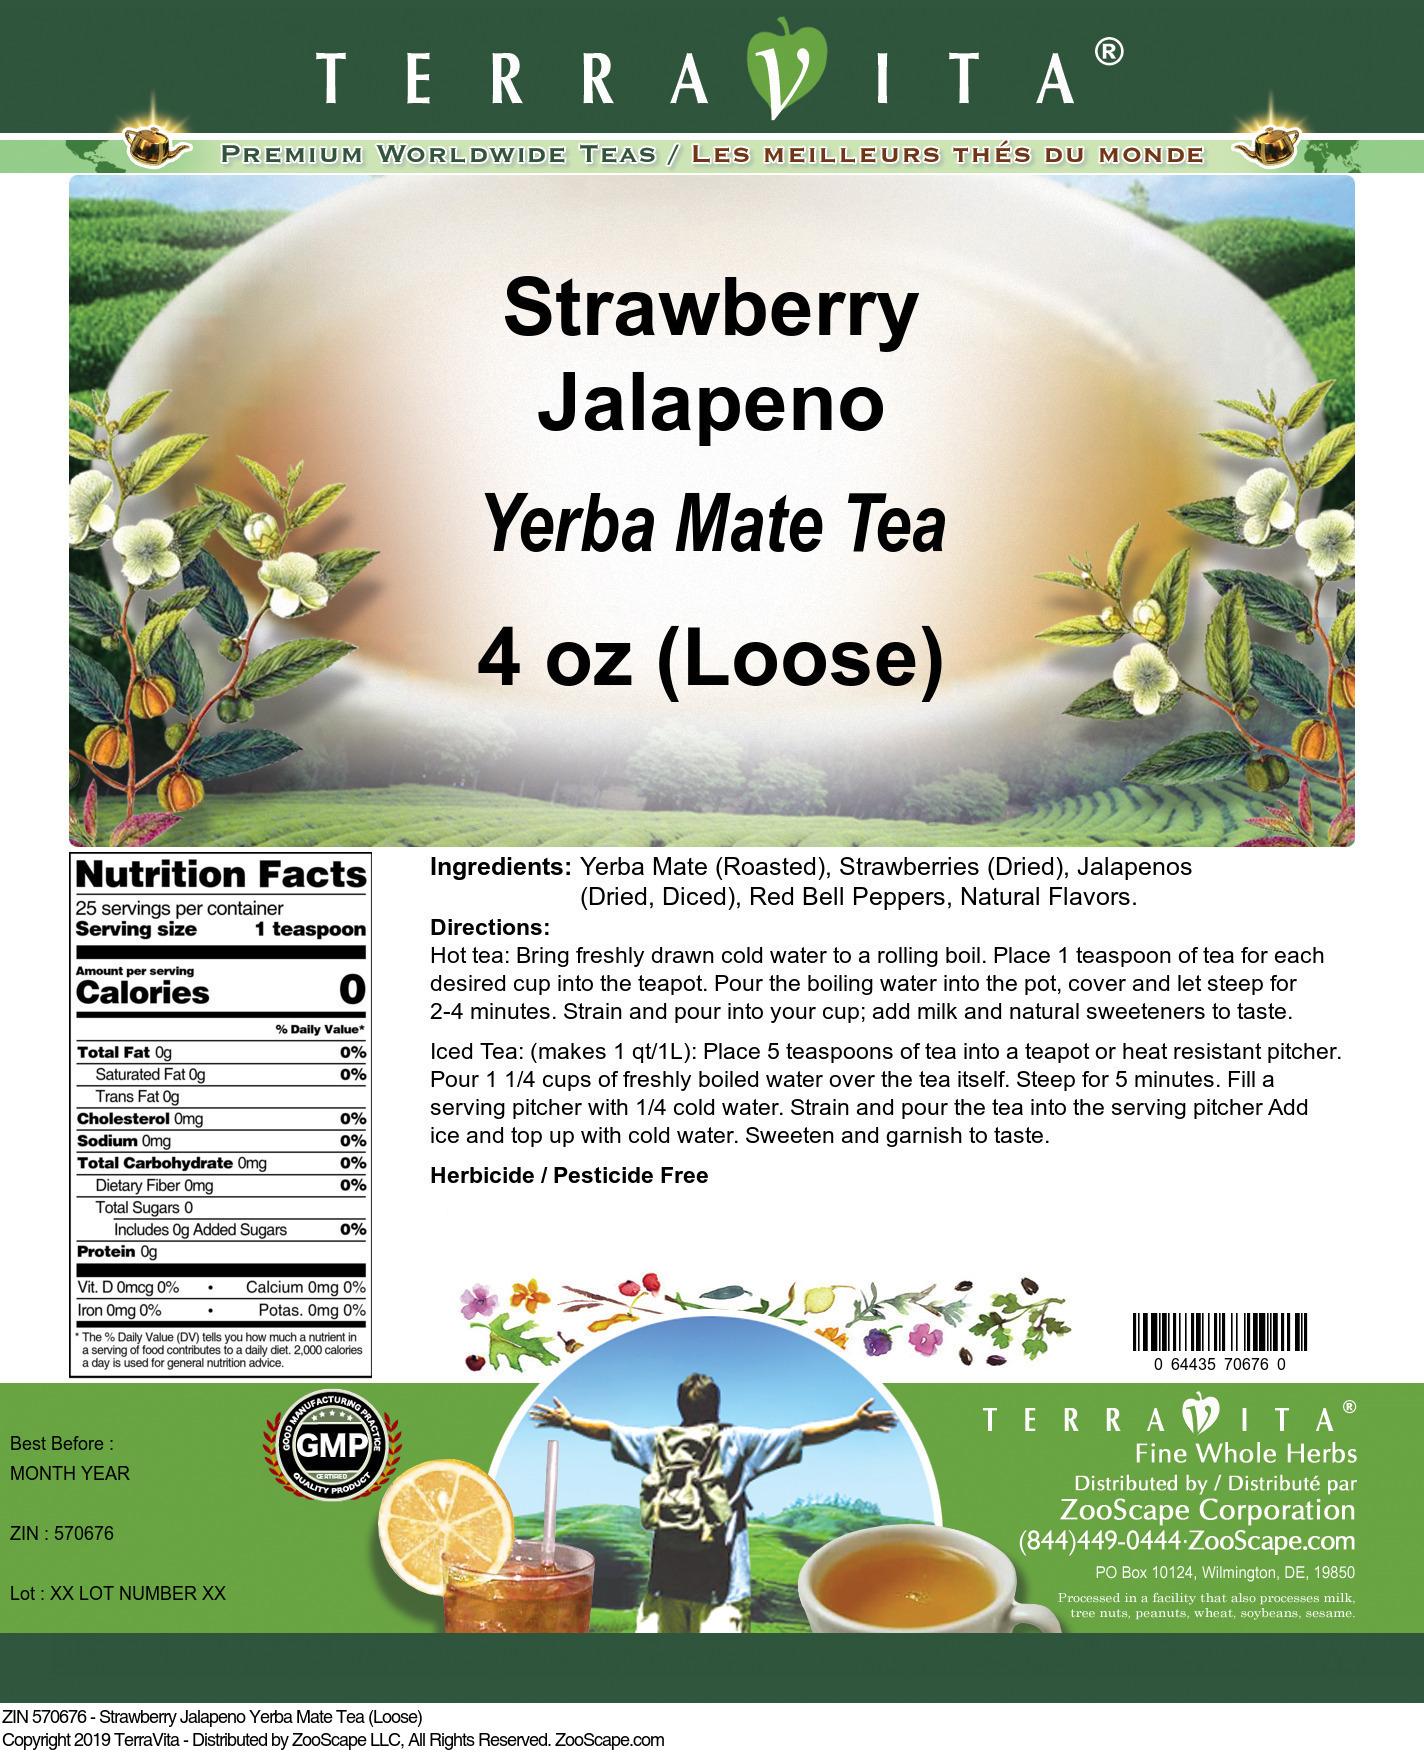 Strawberry Jalapeno Yerba Mate Tea (Loose)